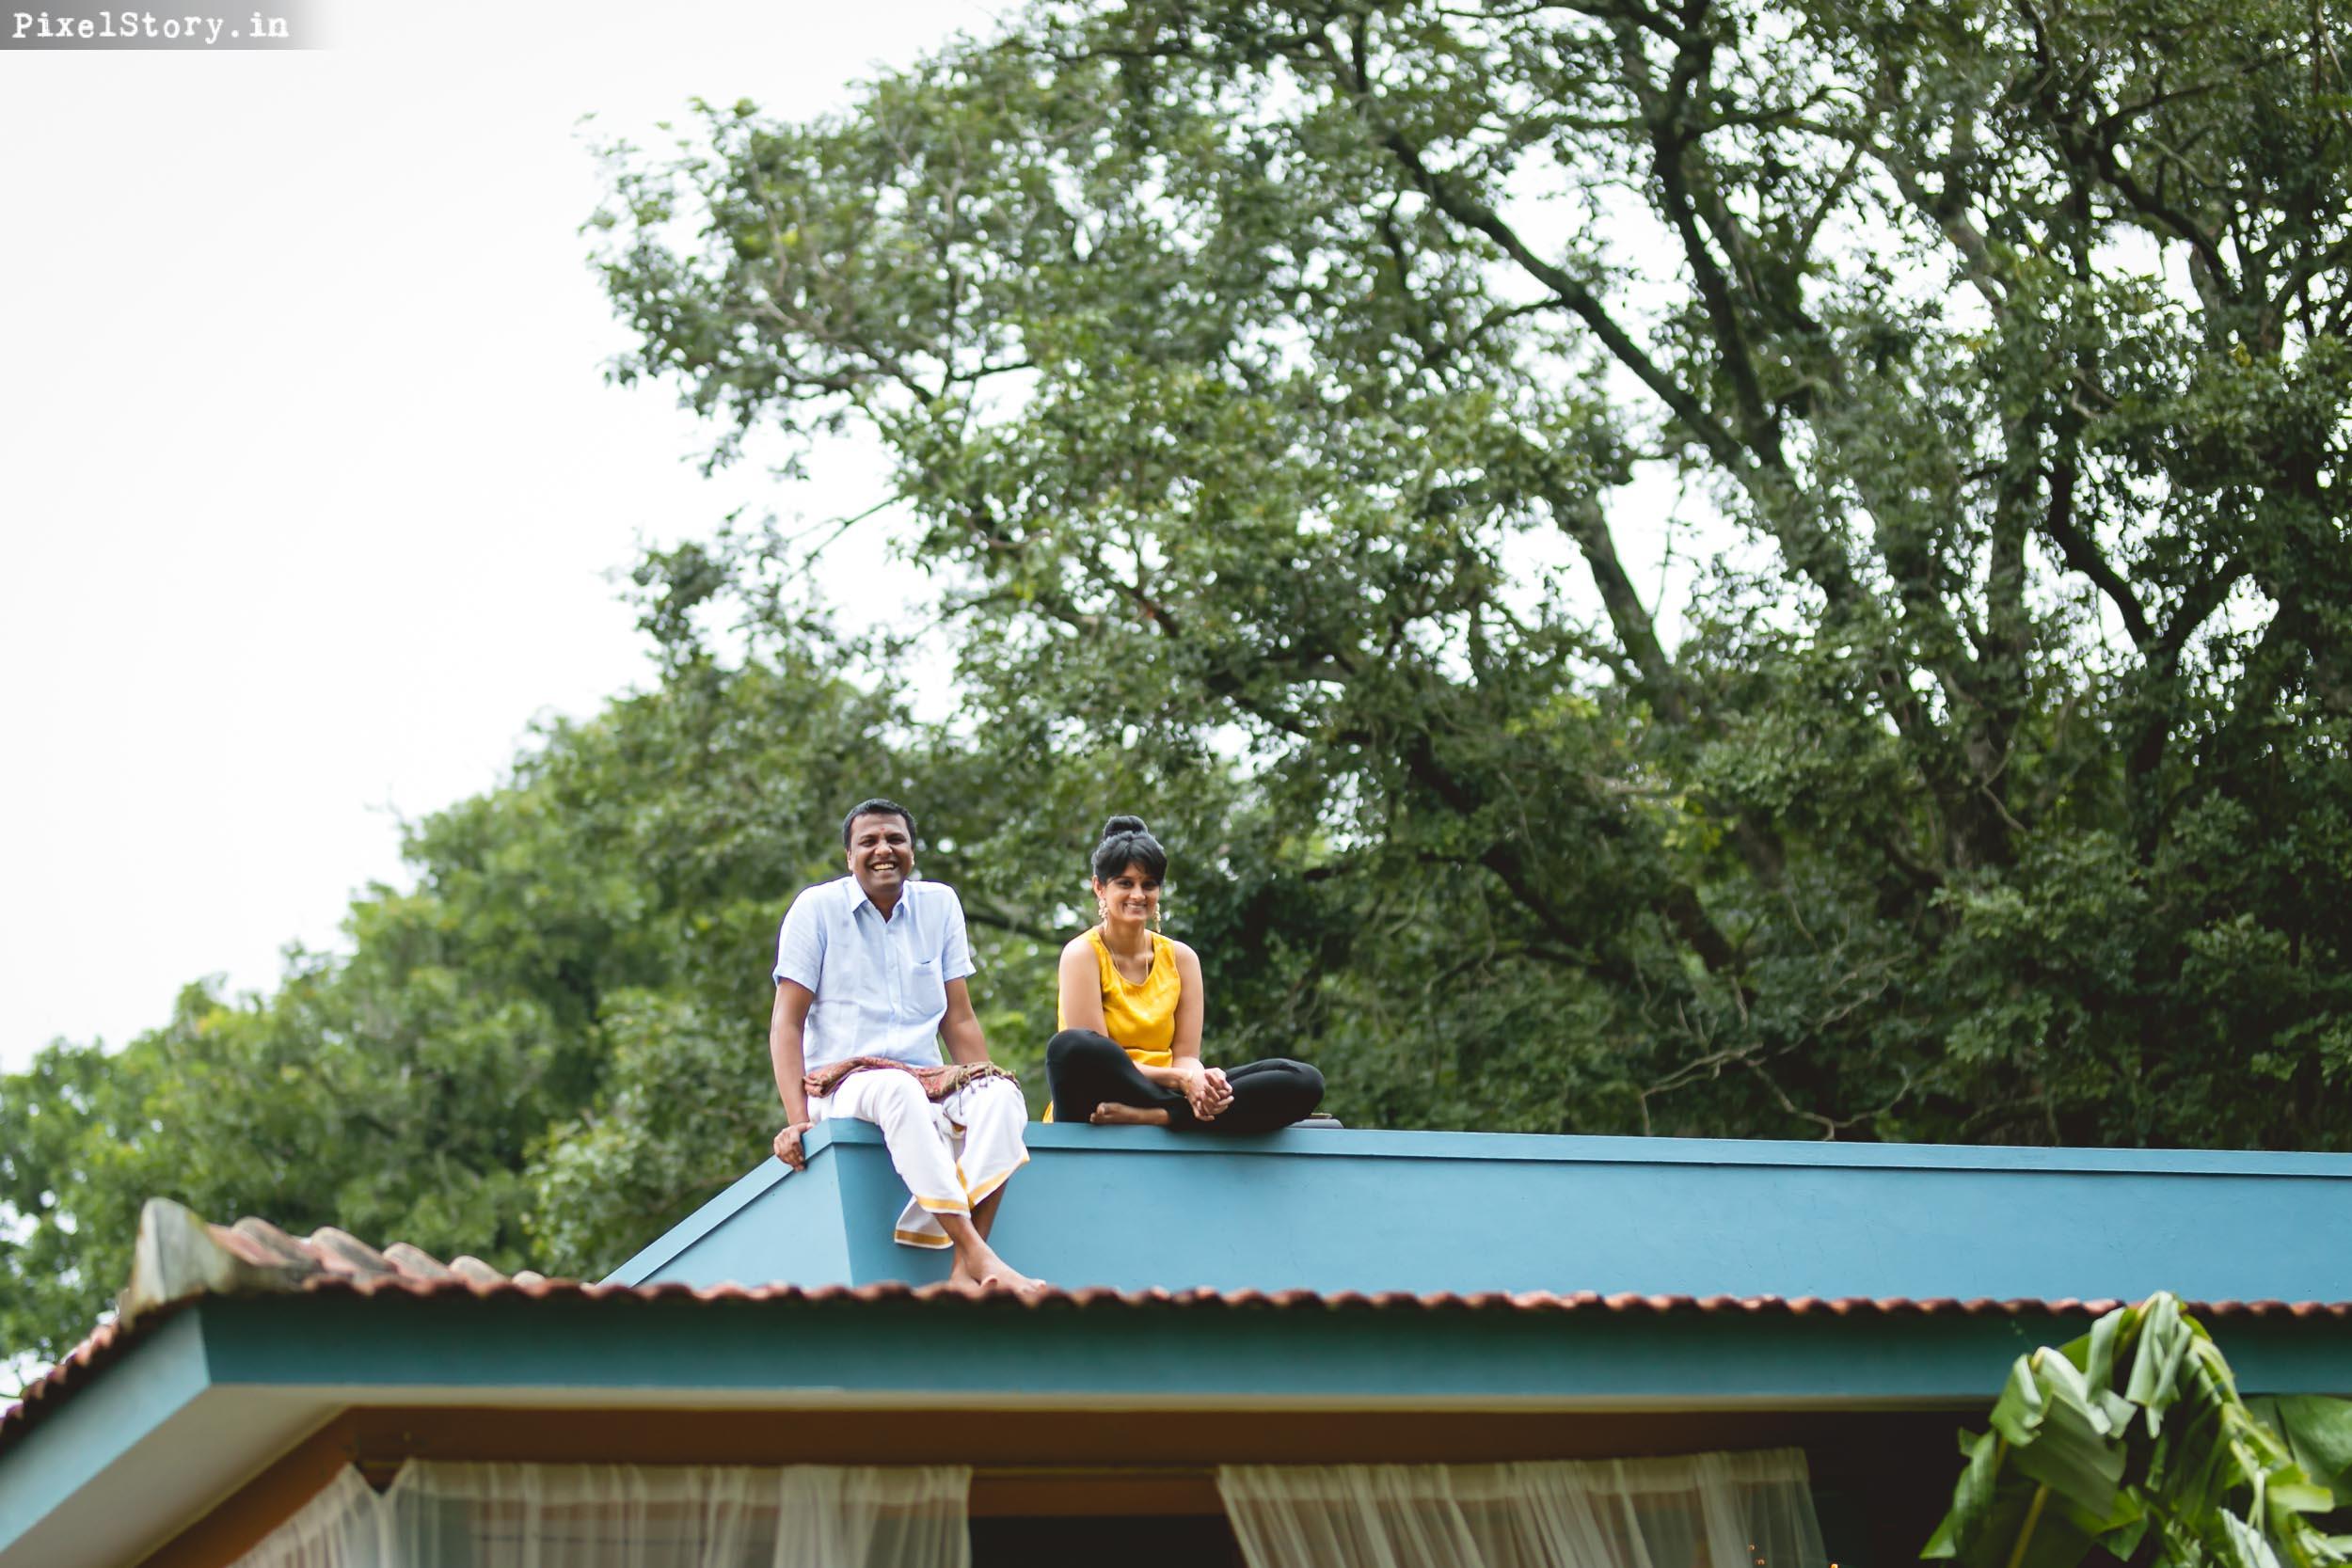 PixelStory-Jungle-Wedding-Photographer-Masinagudi-Indo-French064.jpg